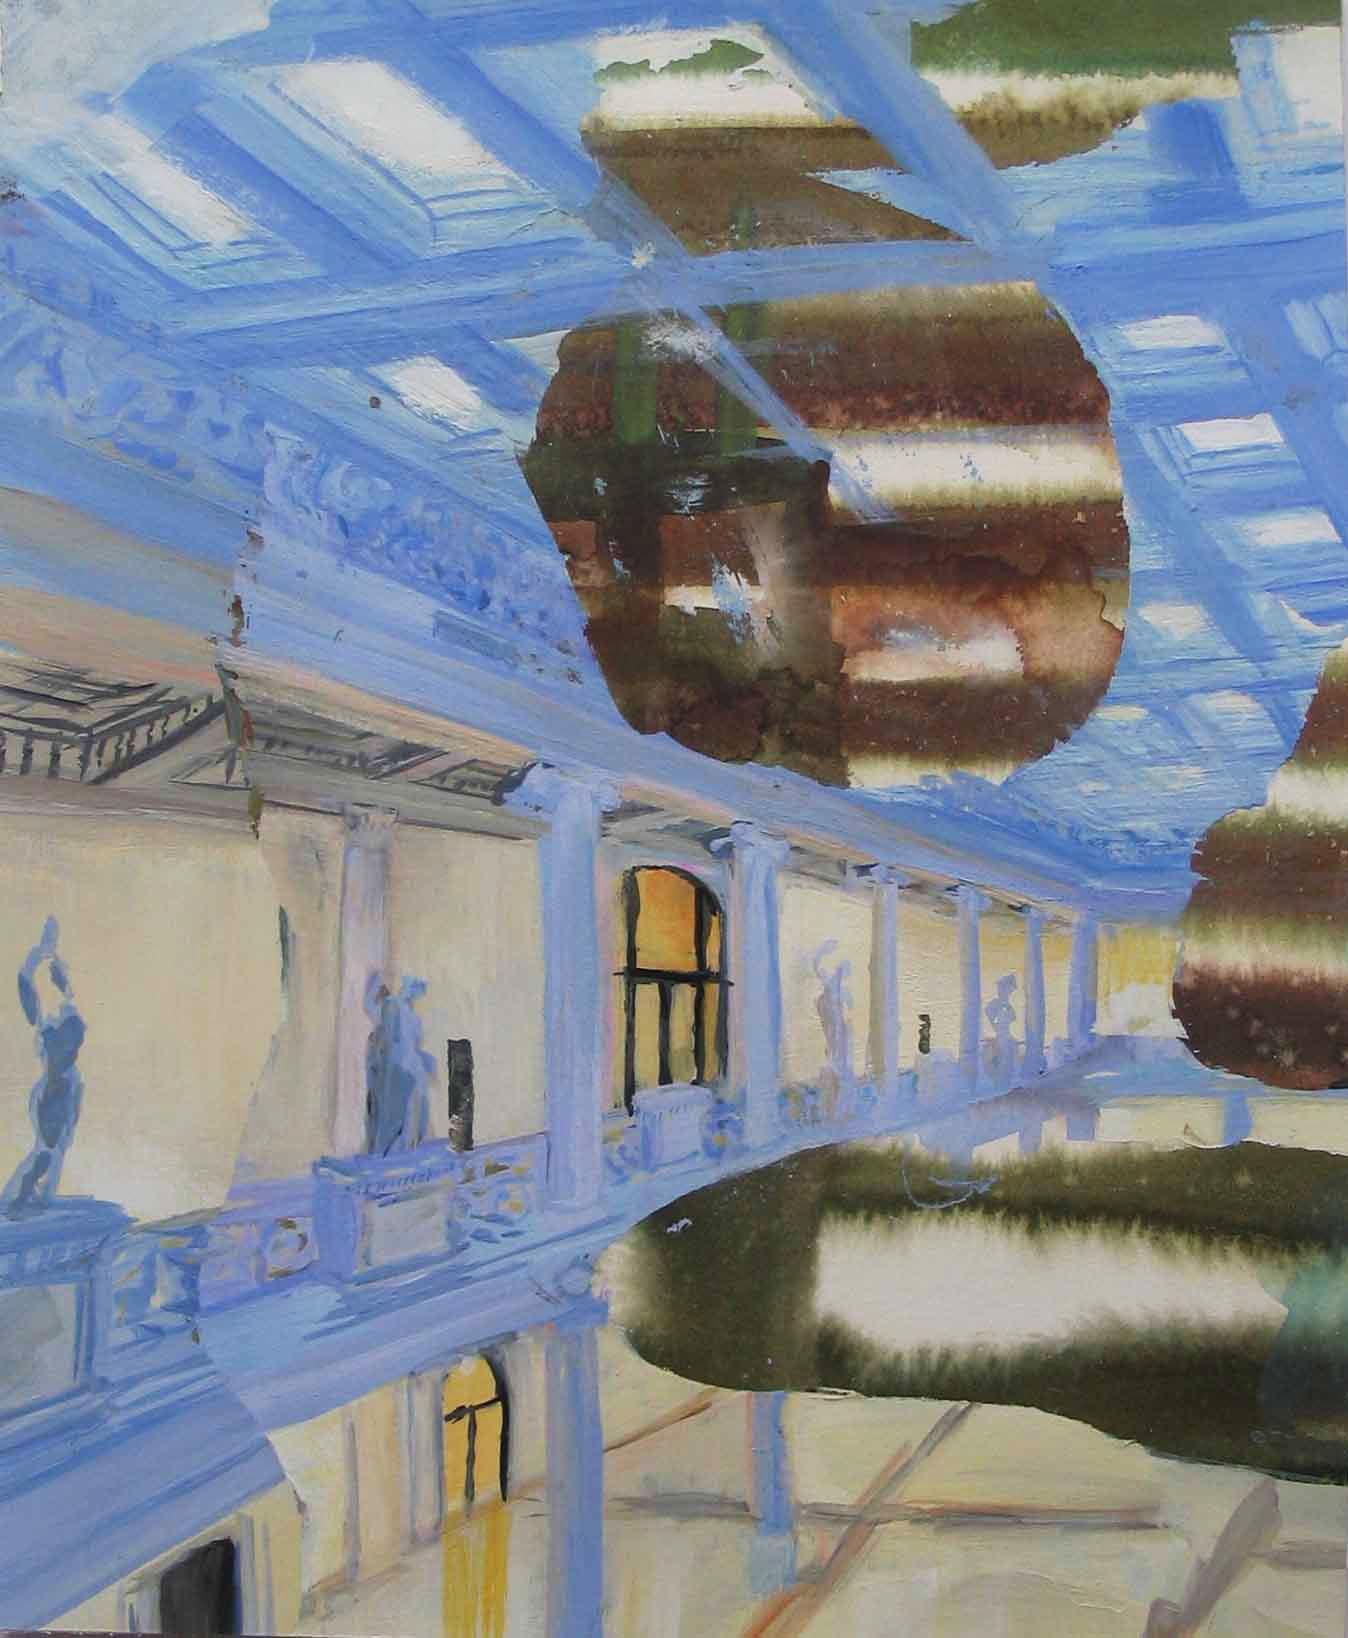 "Museum Getty 15"" x 11"" gouache & watercolor"